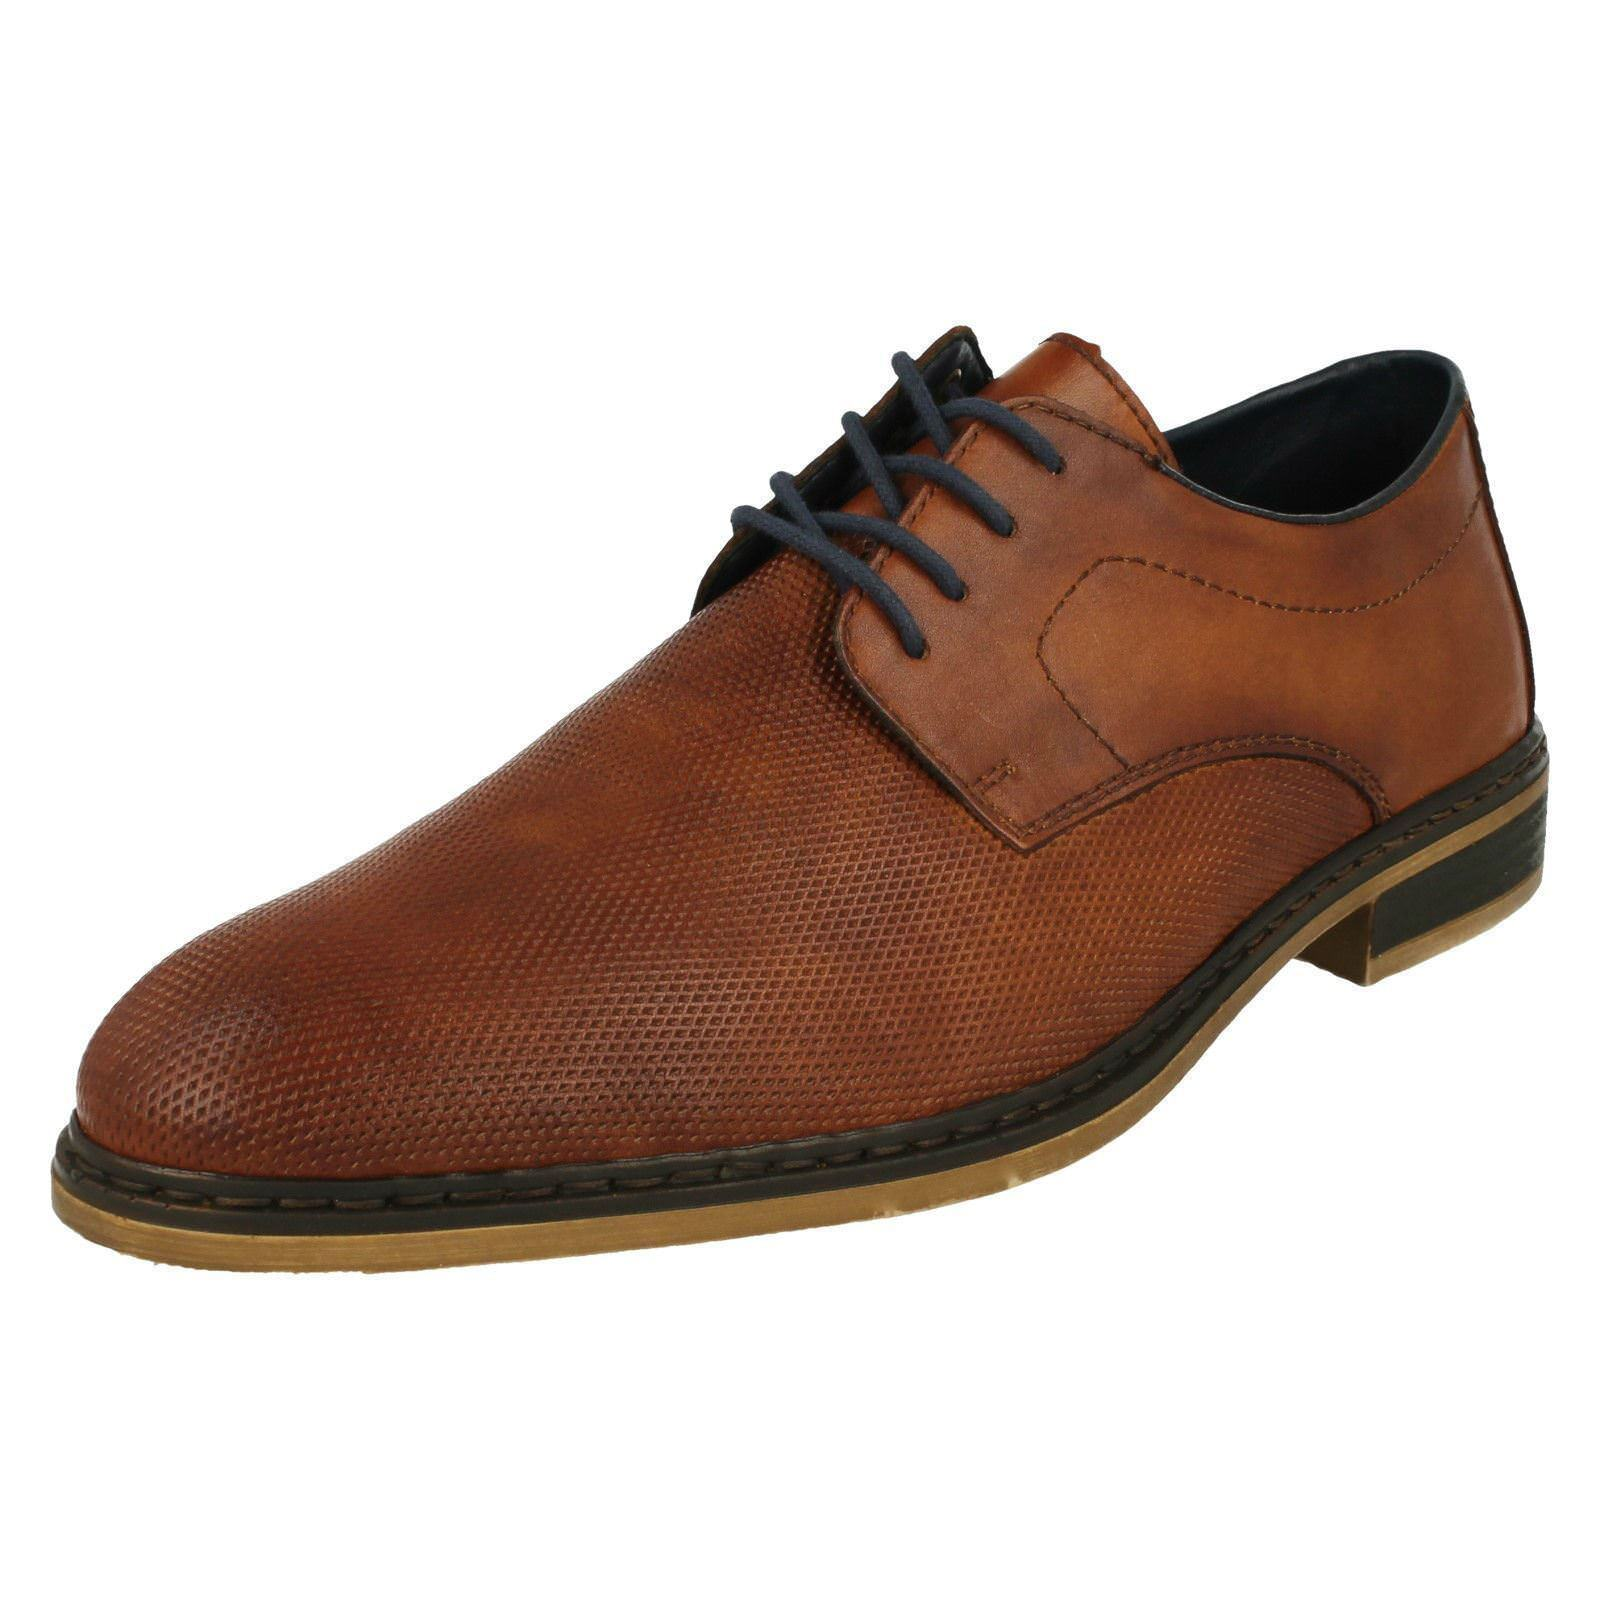 Herren Rieker 11415 Braun Leder Lace Up Schuhes 223814